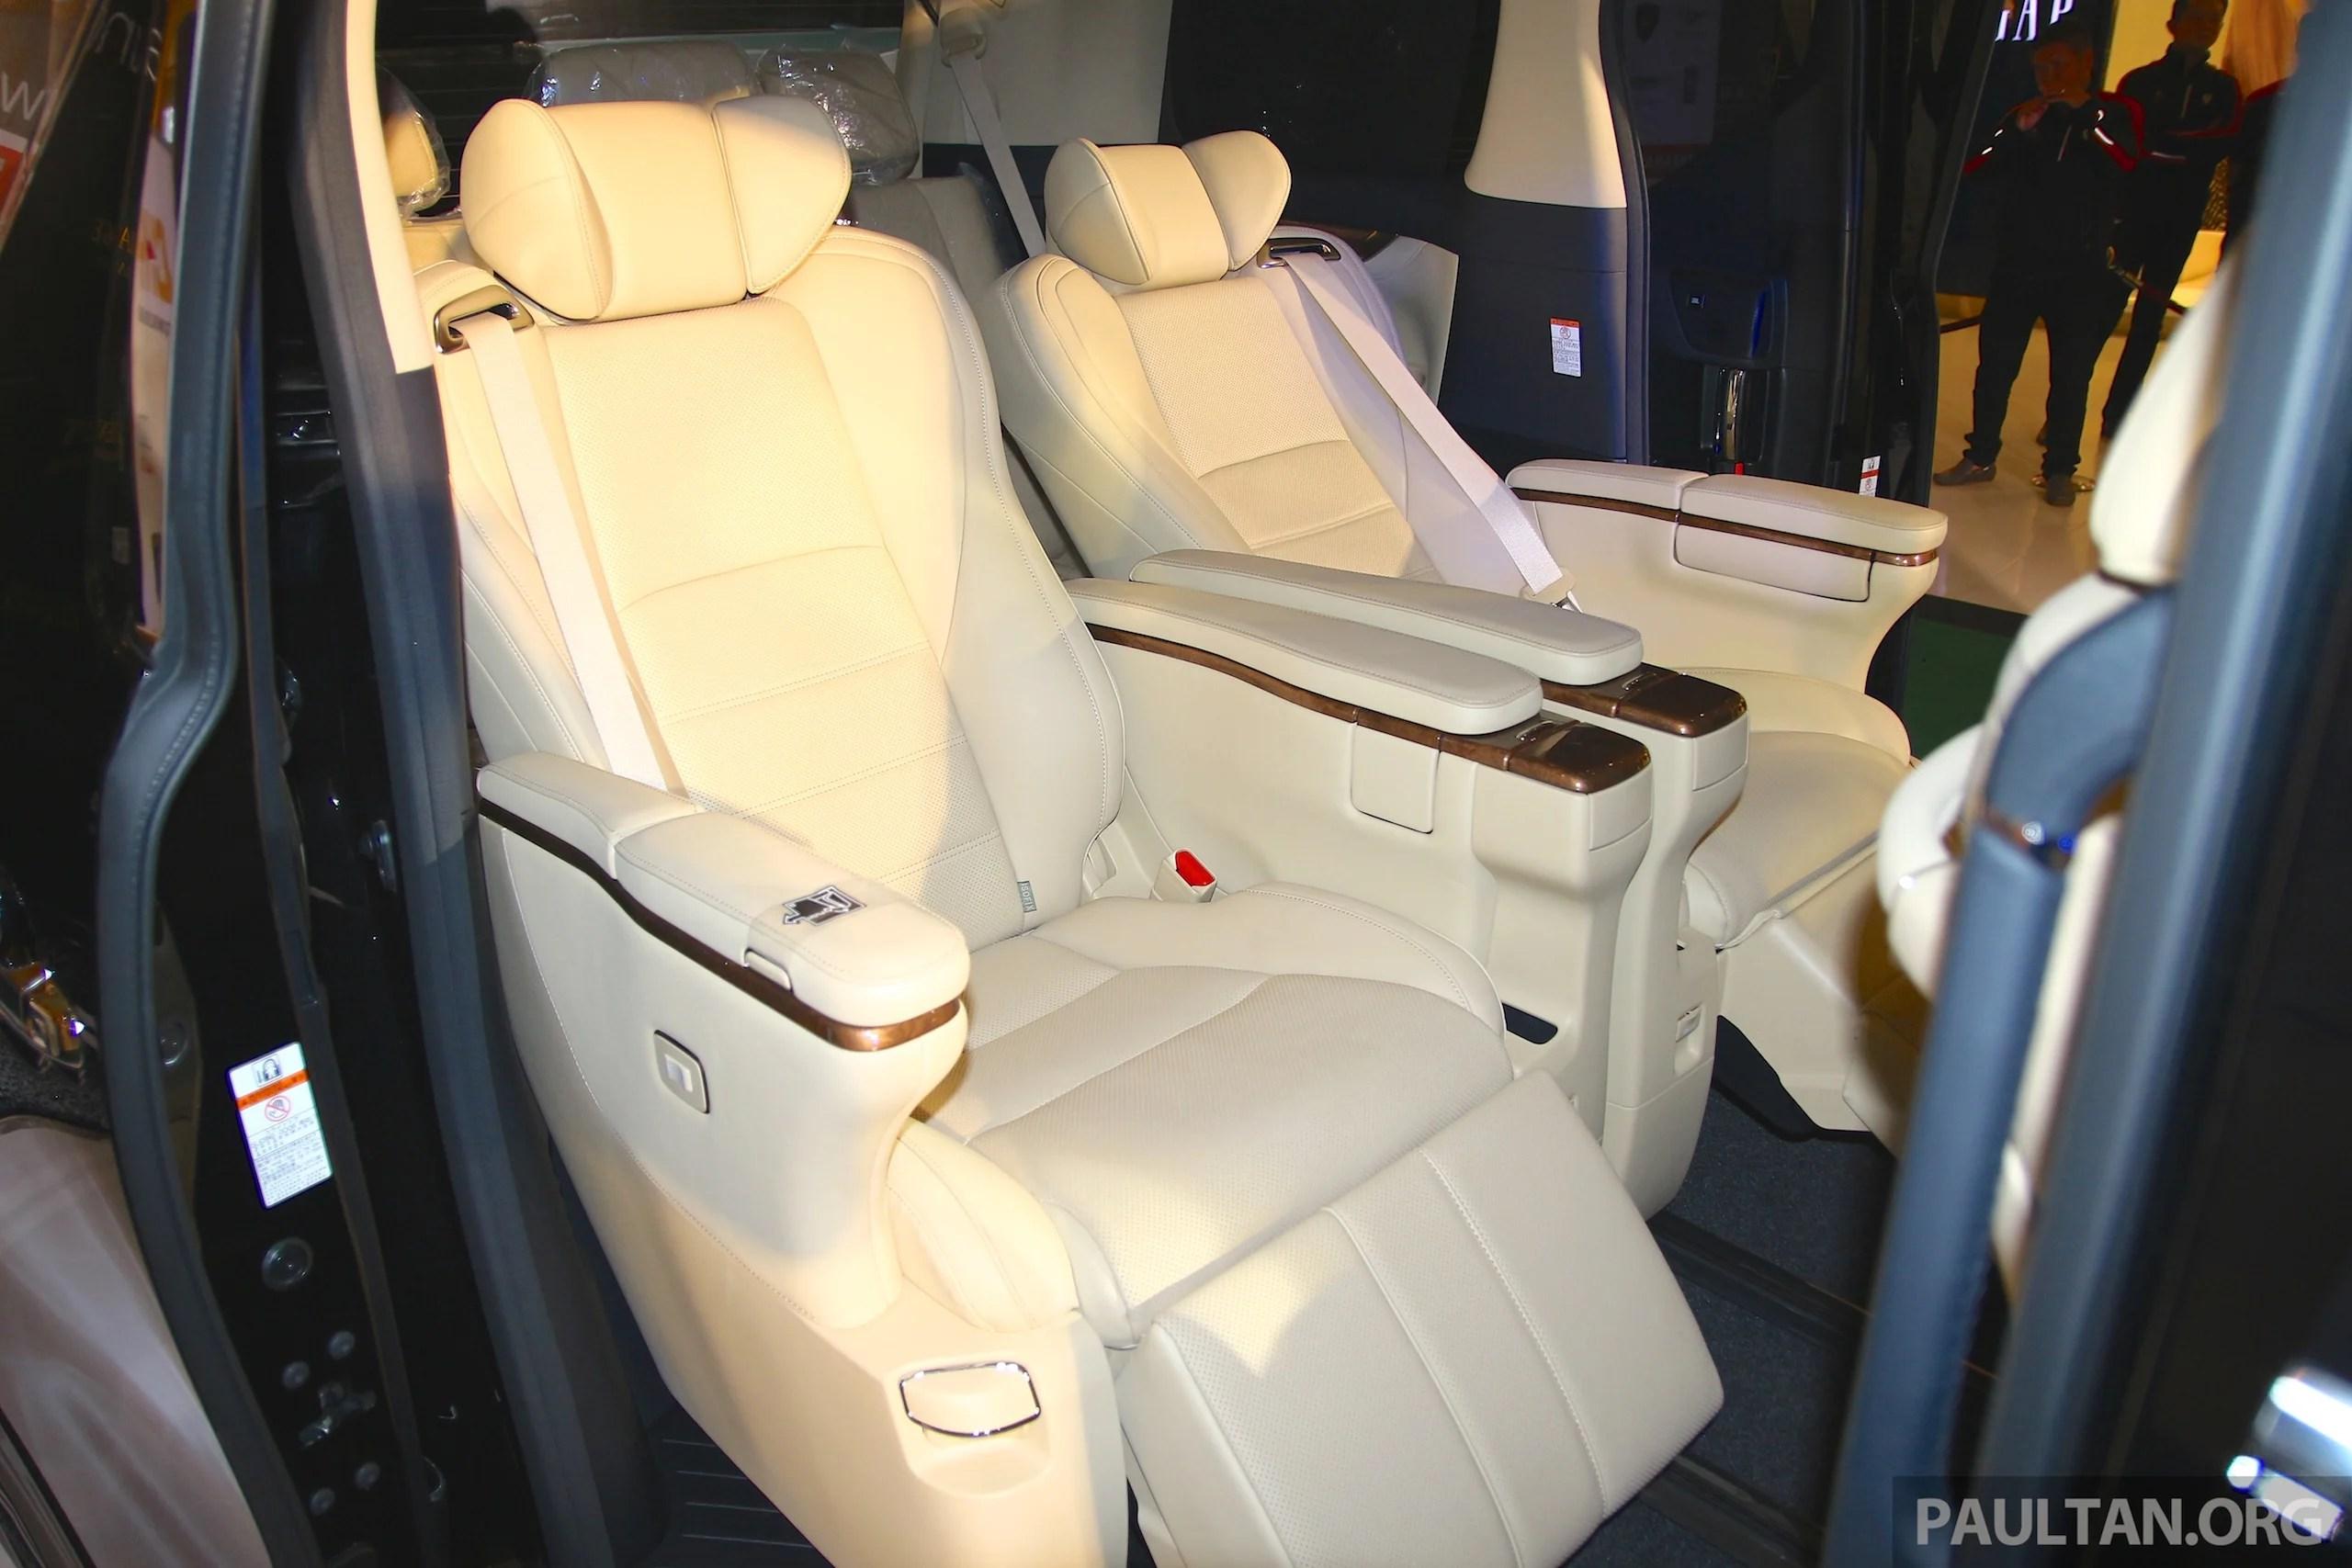 harga all new alphard executive lounge pilihan warna grand avanza 2018 2015 toyota vellfire 3 5 now in malaysia 027